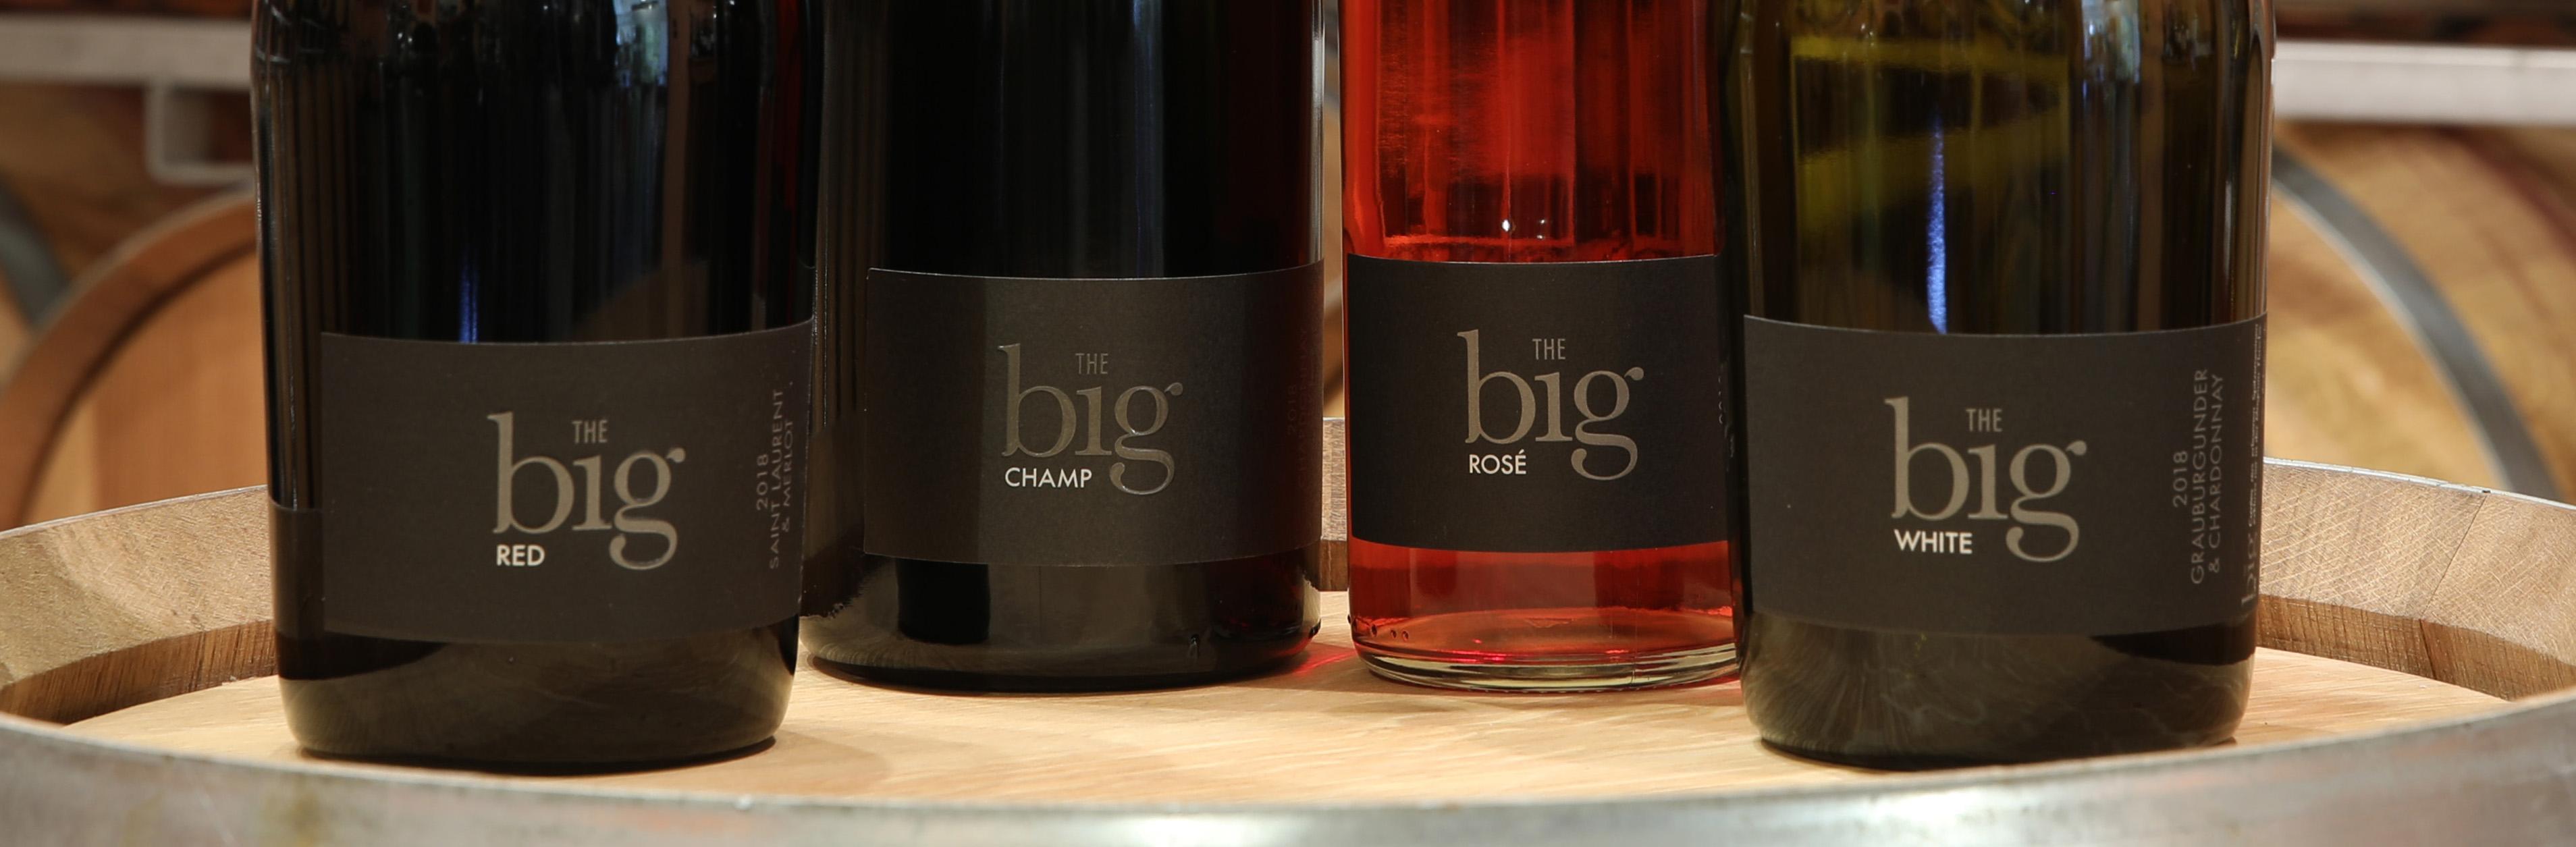 THE big ONE Kollektion 2020 ab sofort im Online-Shop verfügbar